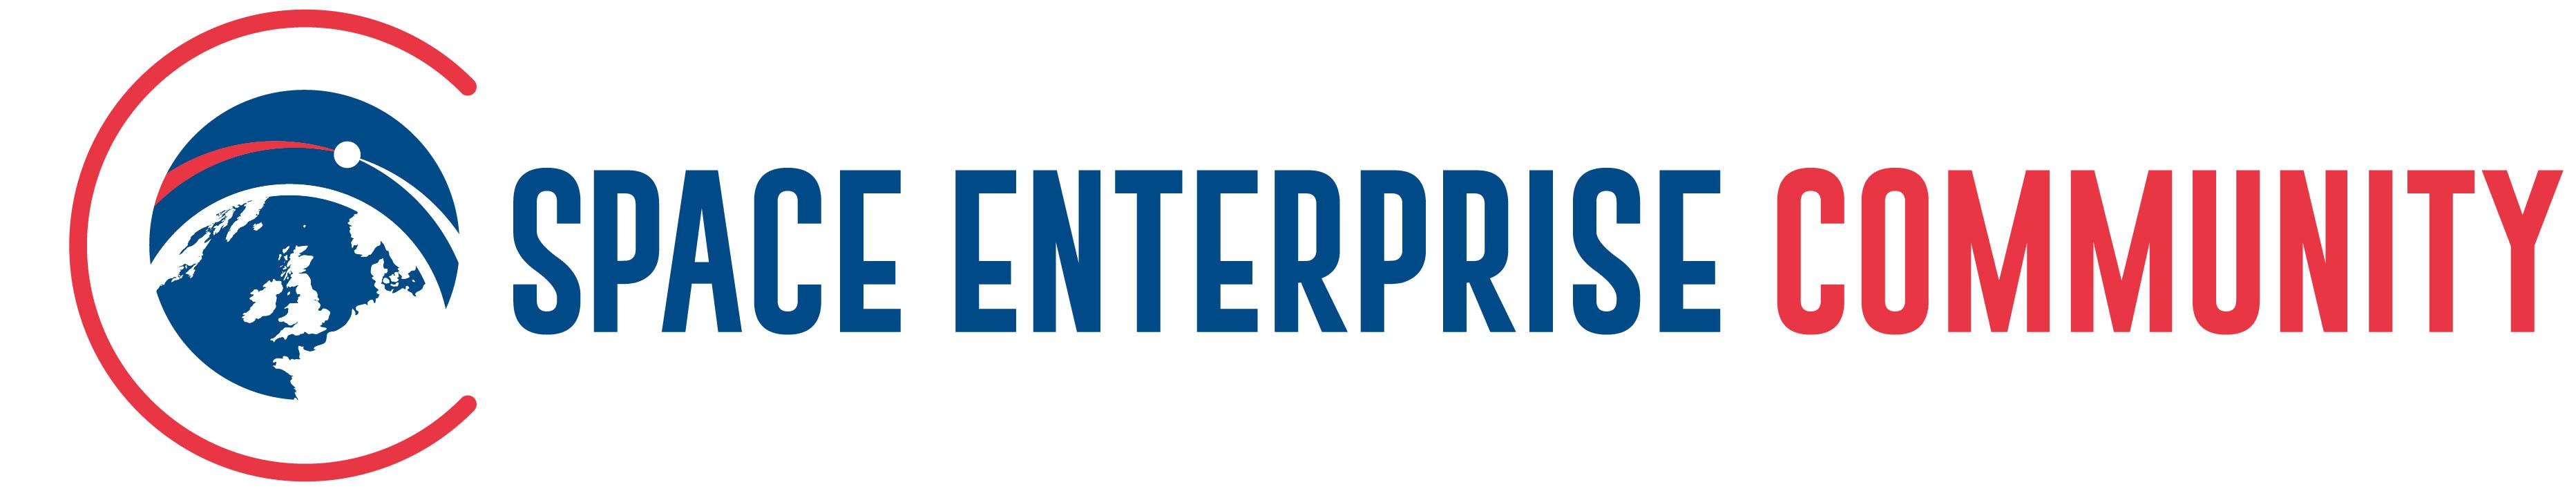 The Space Enterprise Community logo